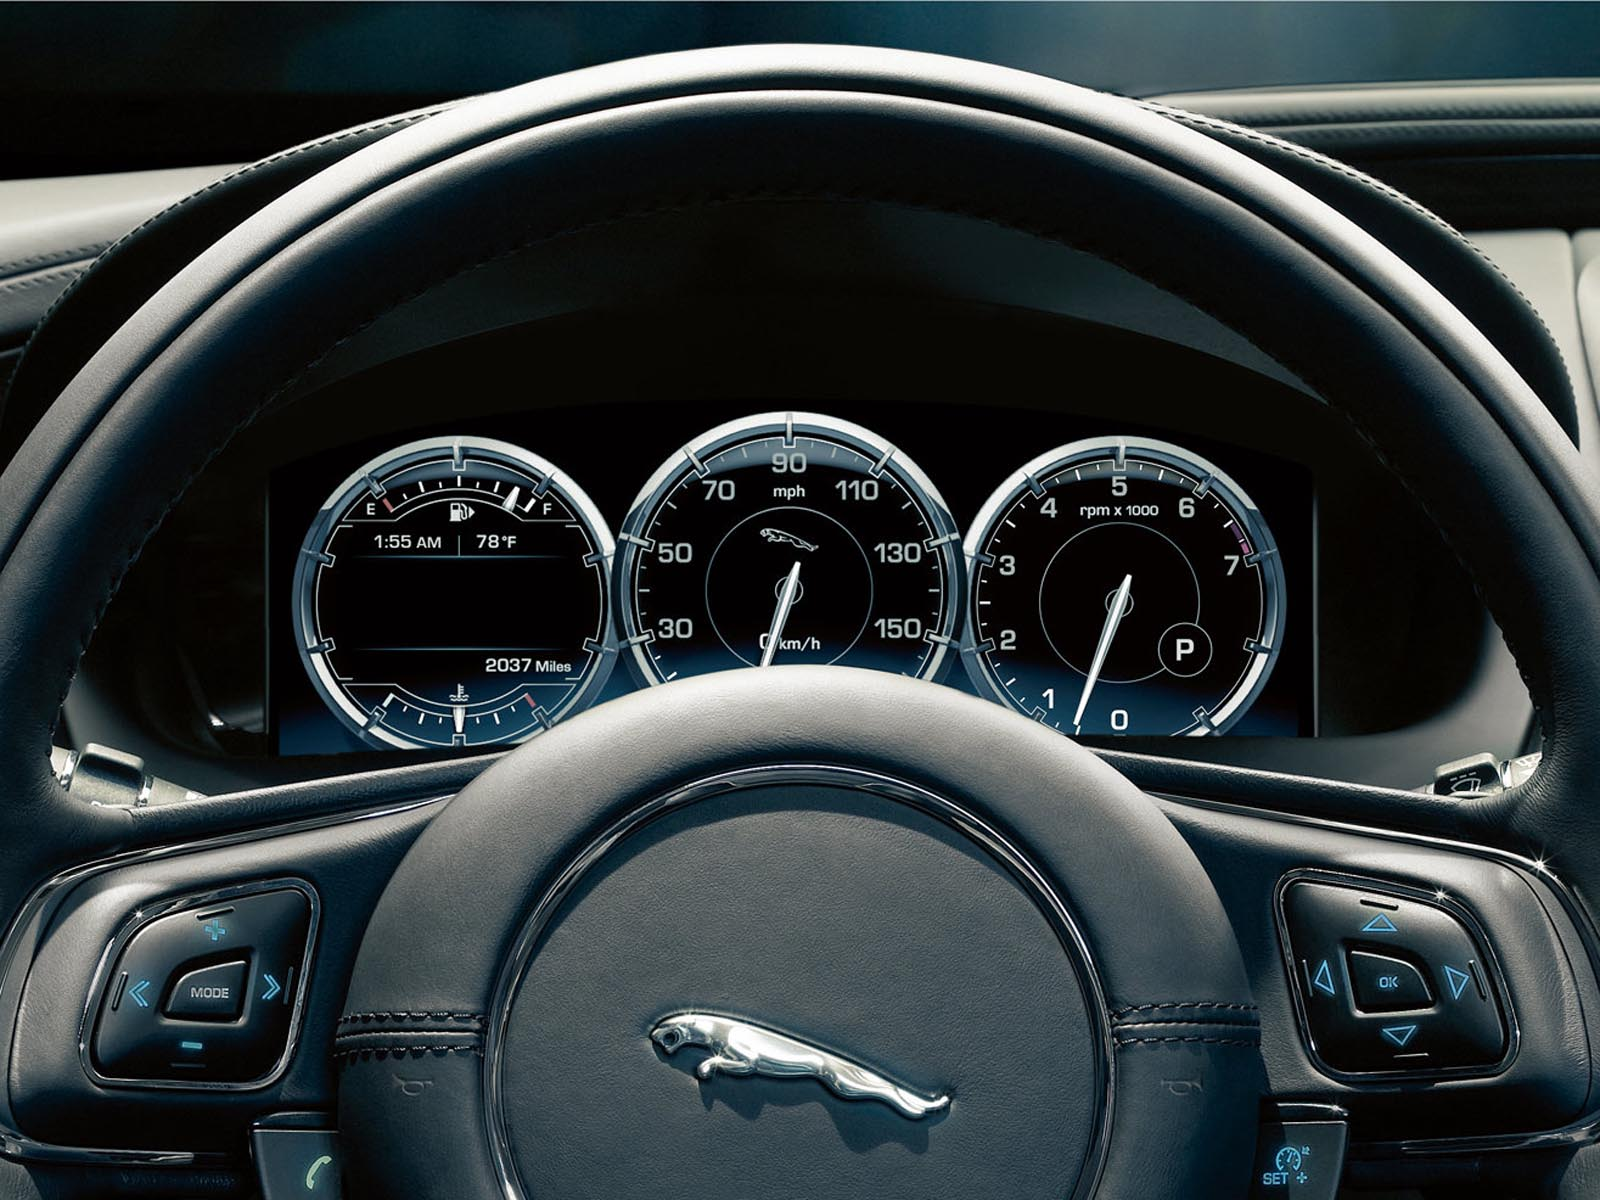 2017 New York Auto Show 6 Speedy Picks For Under 60000 additionally Hyundai Stellar also 2018 Hyundai Genesis G70 Release Date And Prices as well Jaguar Xj further Crossover. on hyundai sonata engine